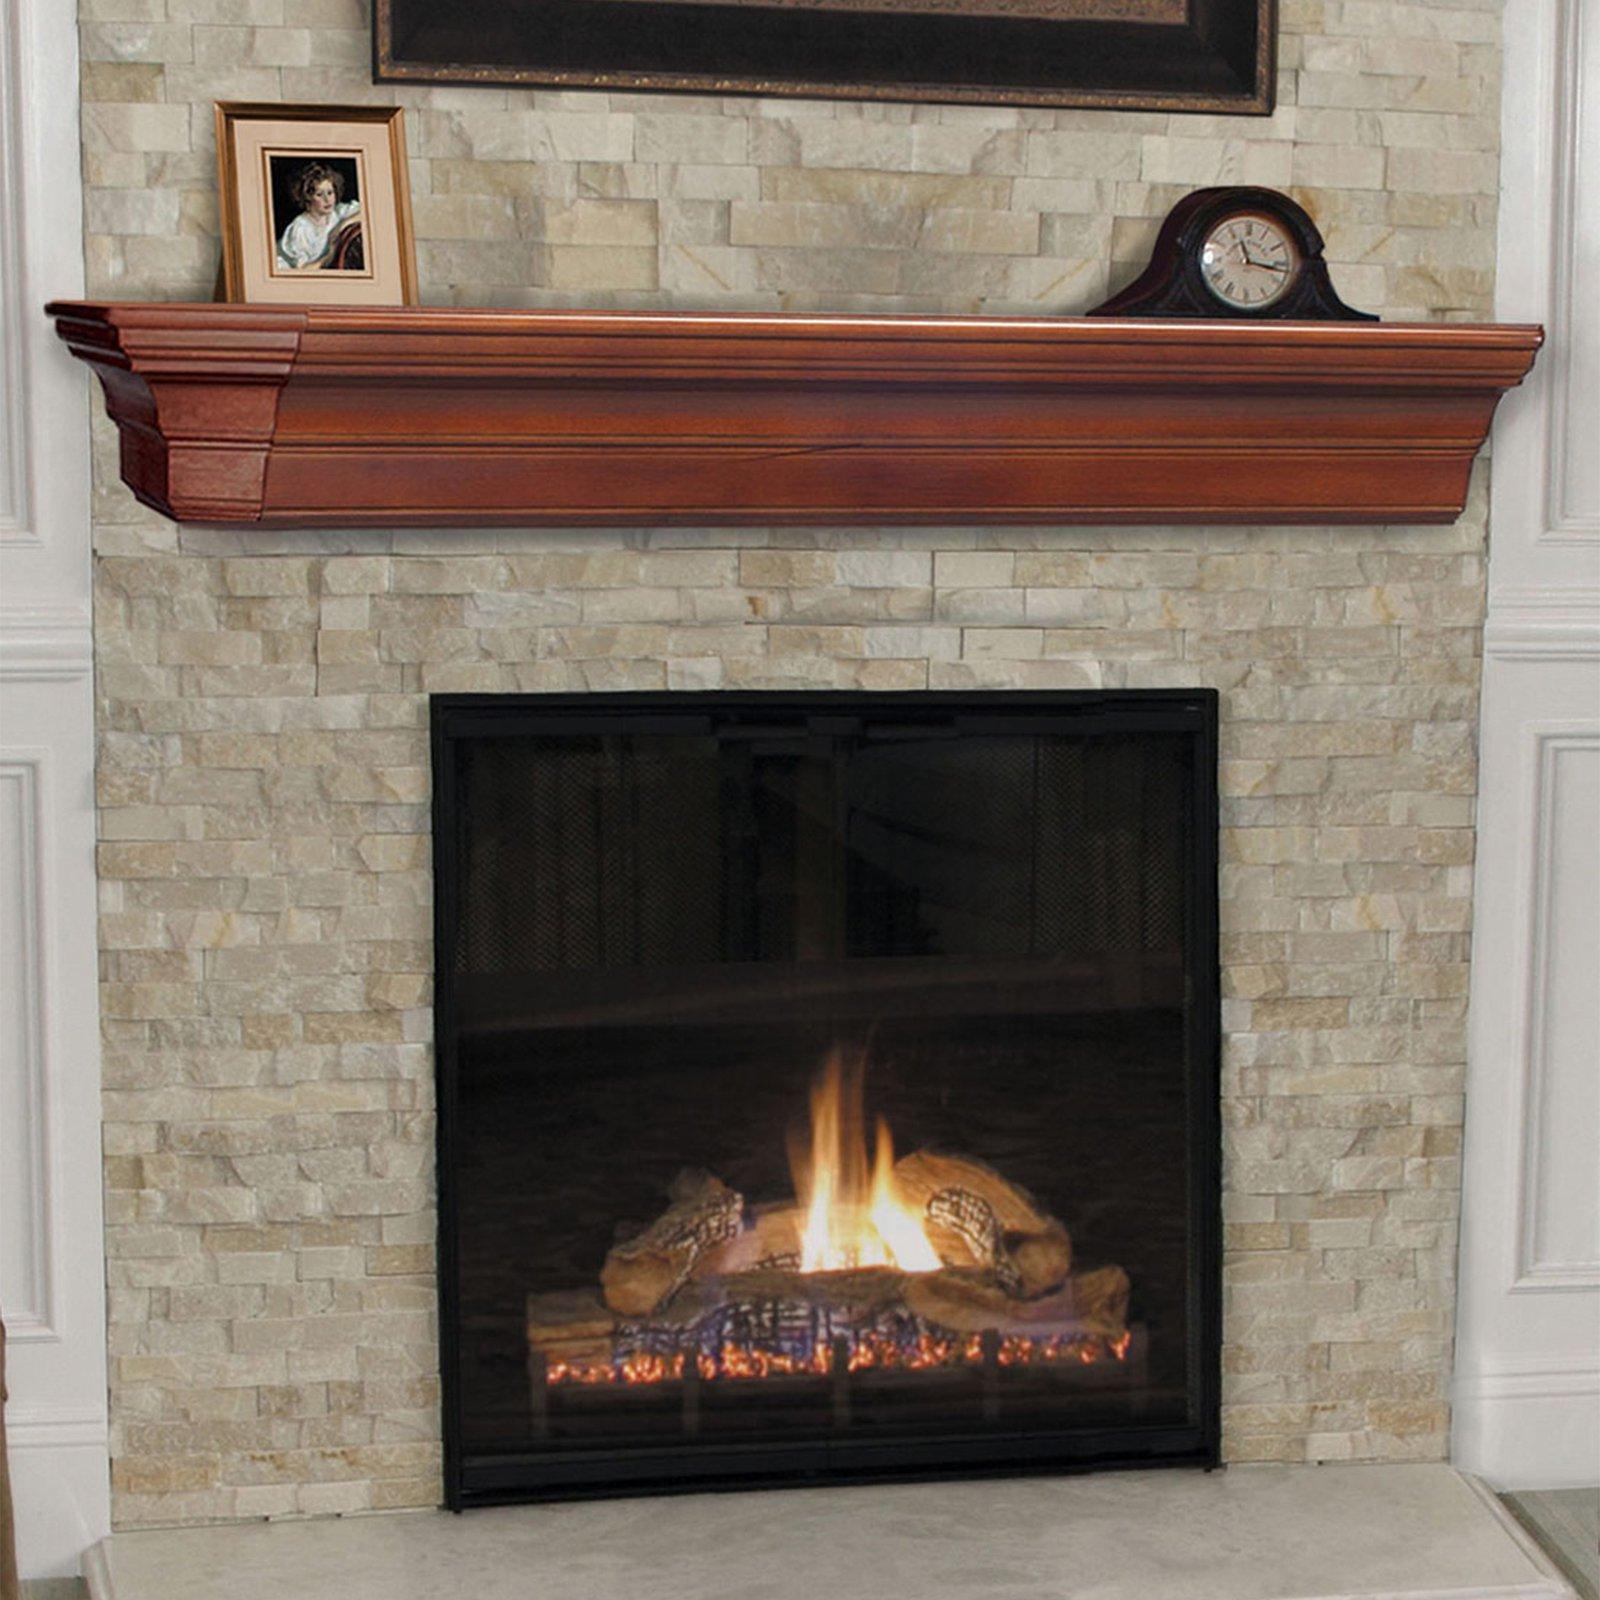 fireplace excellent mantel shelf for shelfs mantels fireplaces solid wood distressed foot floating milo baughman ott black gloss shelves reclaimed diy very small brackets wall